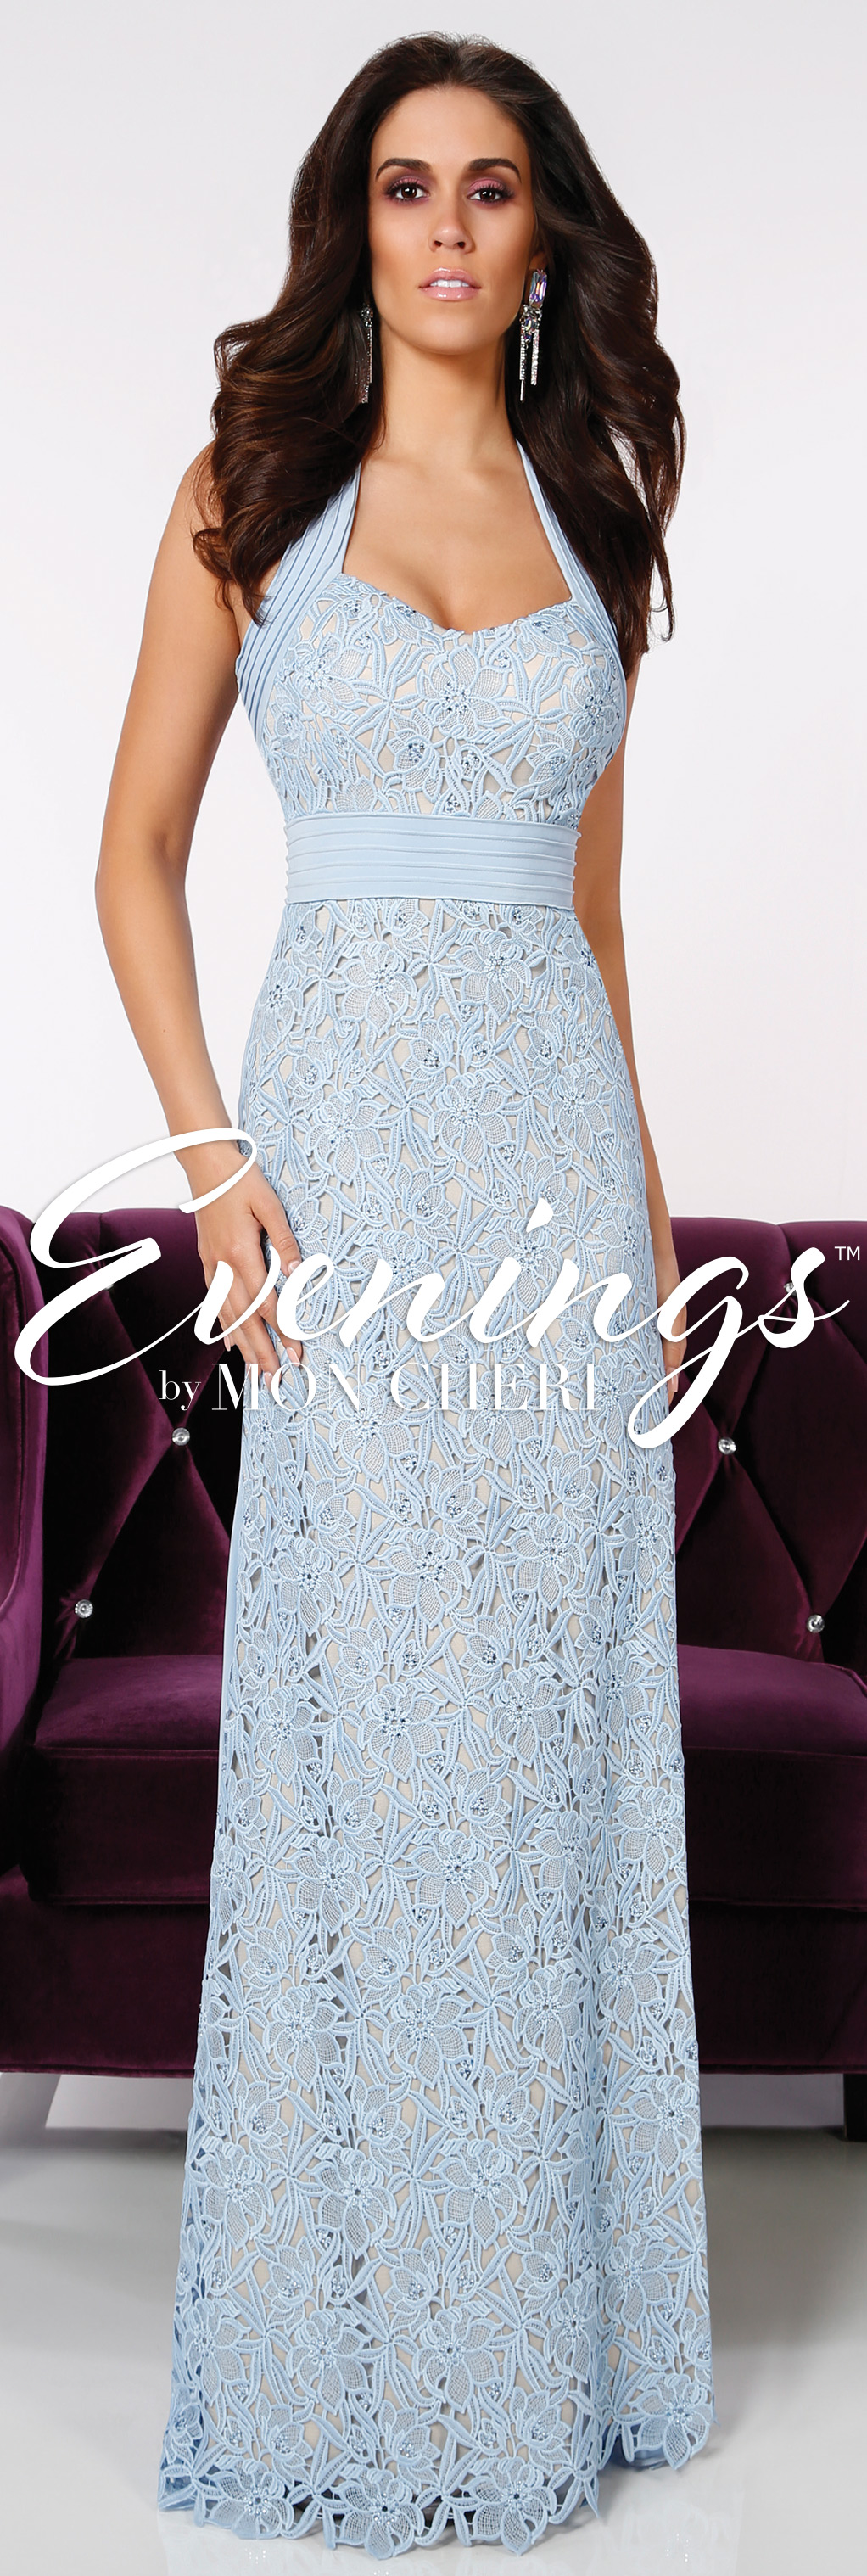 wedding guest dresses 2019  gowns of elegance dresses